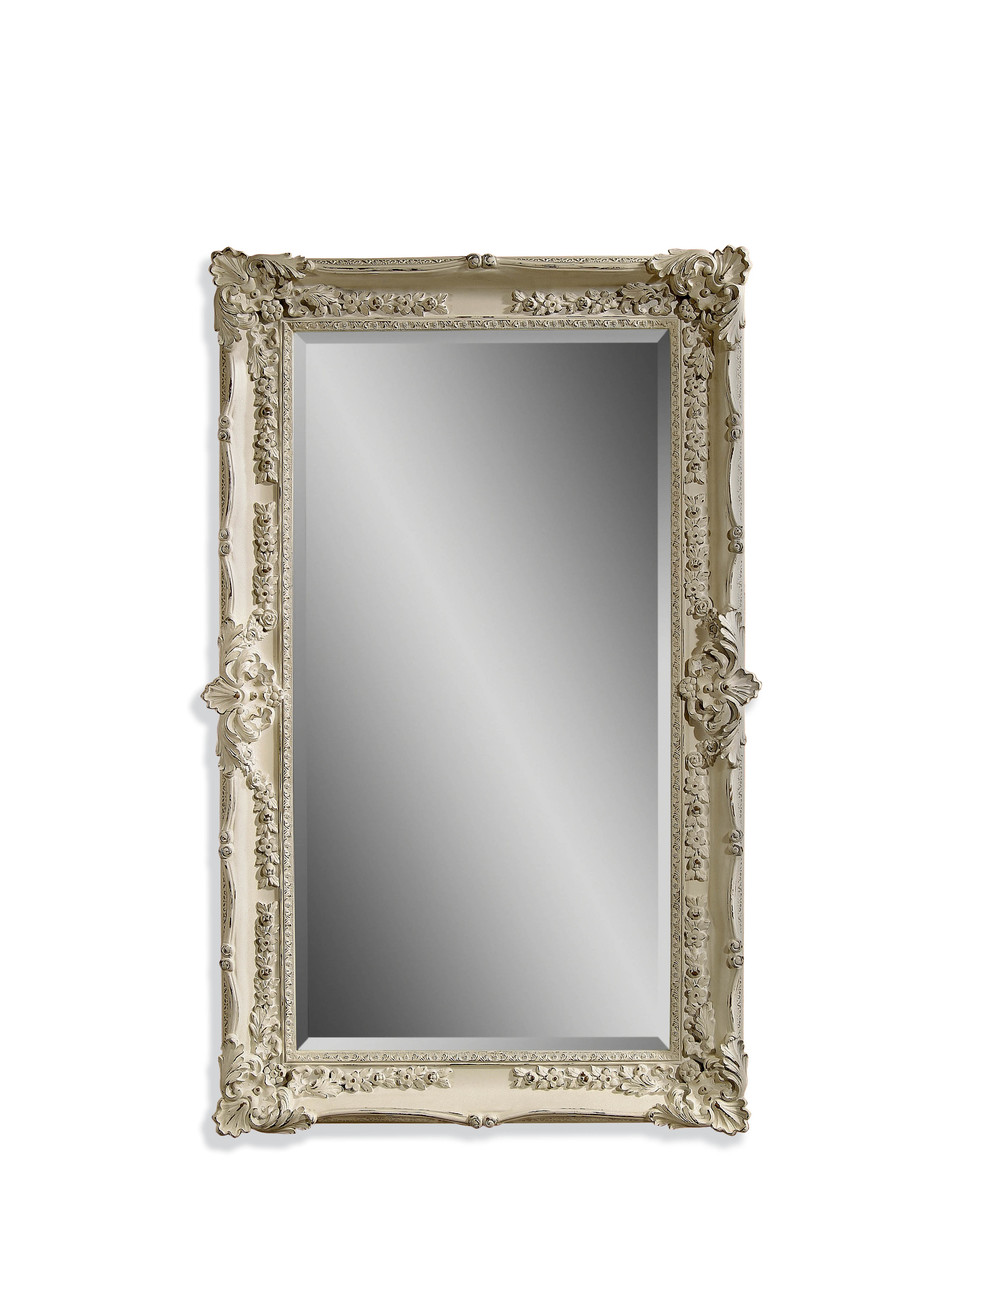 Bassett Mirror Company - Garland Wall Mirror